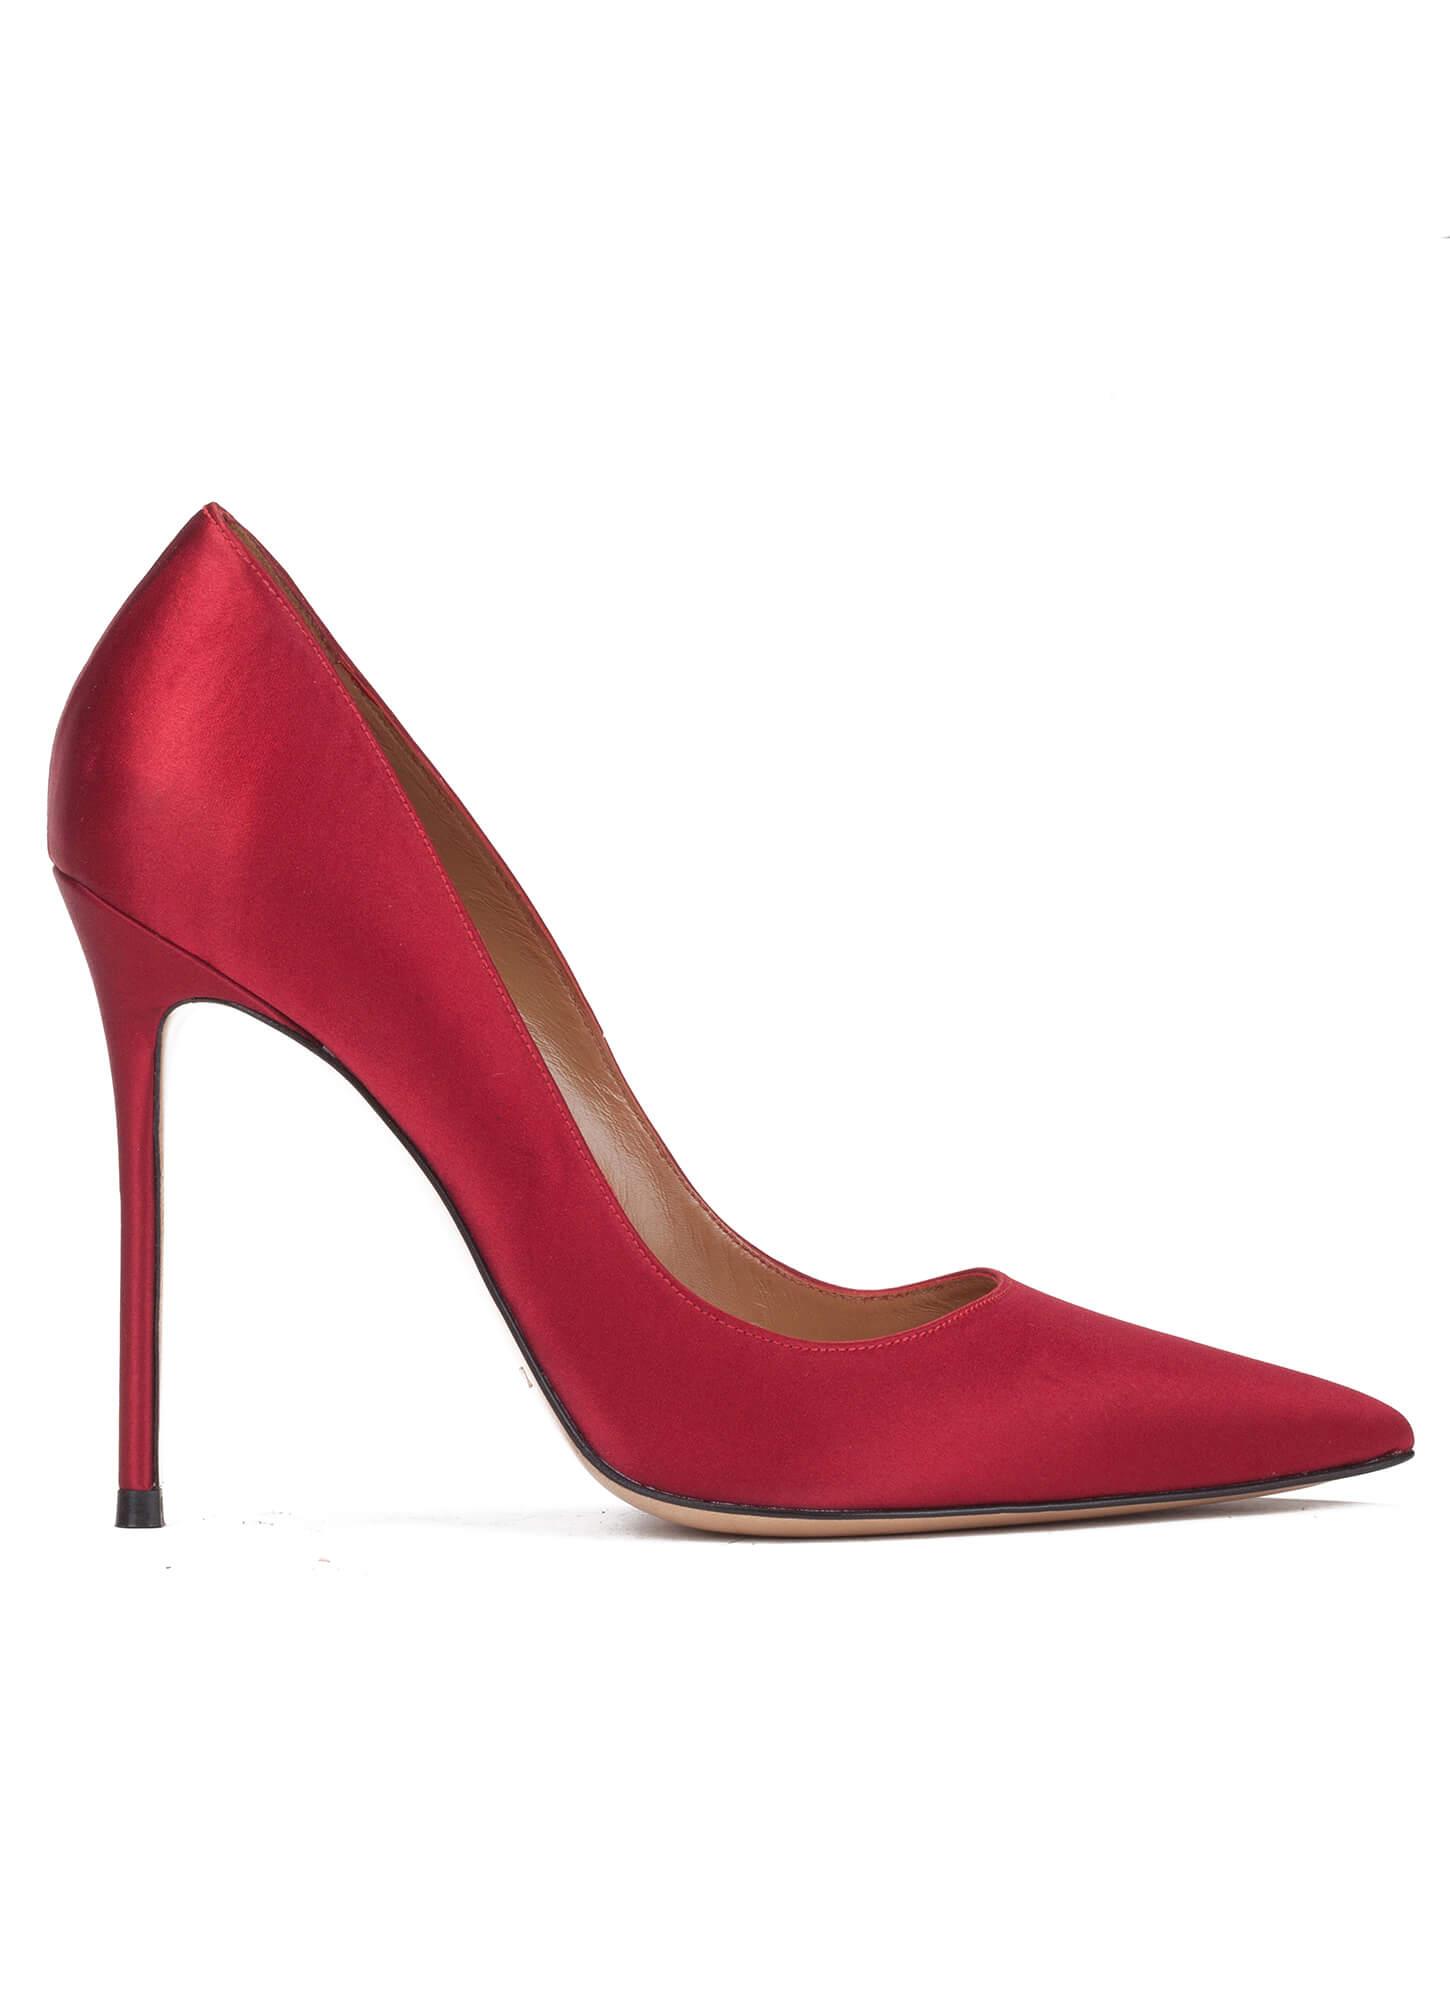 high heel pumps in red satin online shoe store pura. Black Bedroom Furniture Sets. Home Design Ideas